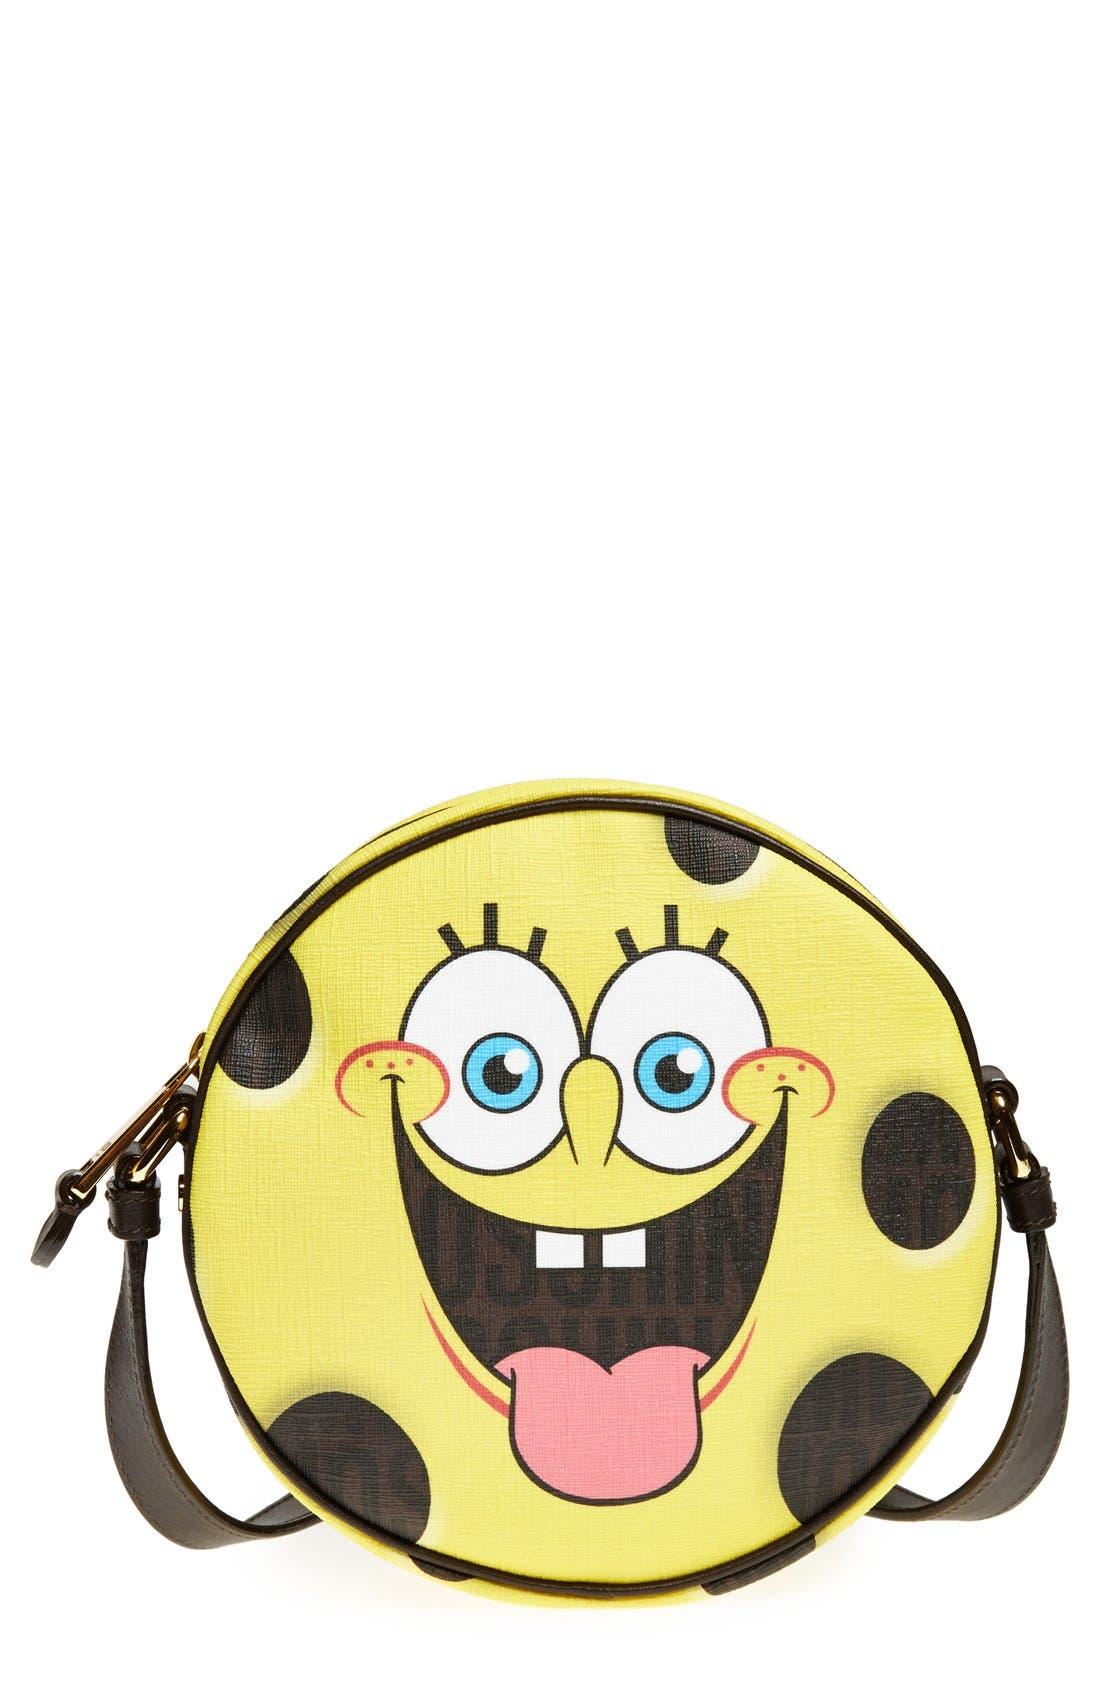 Alternate Image 1 Selected - Moschino 'SpongeBob' Crossbody Bag